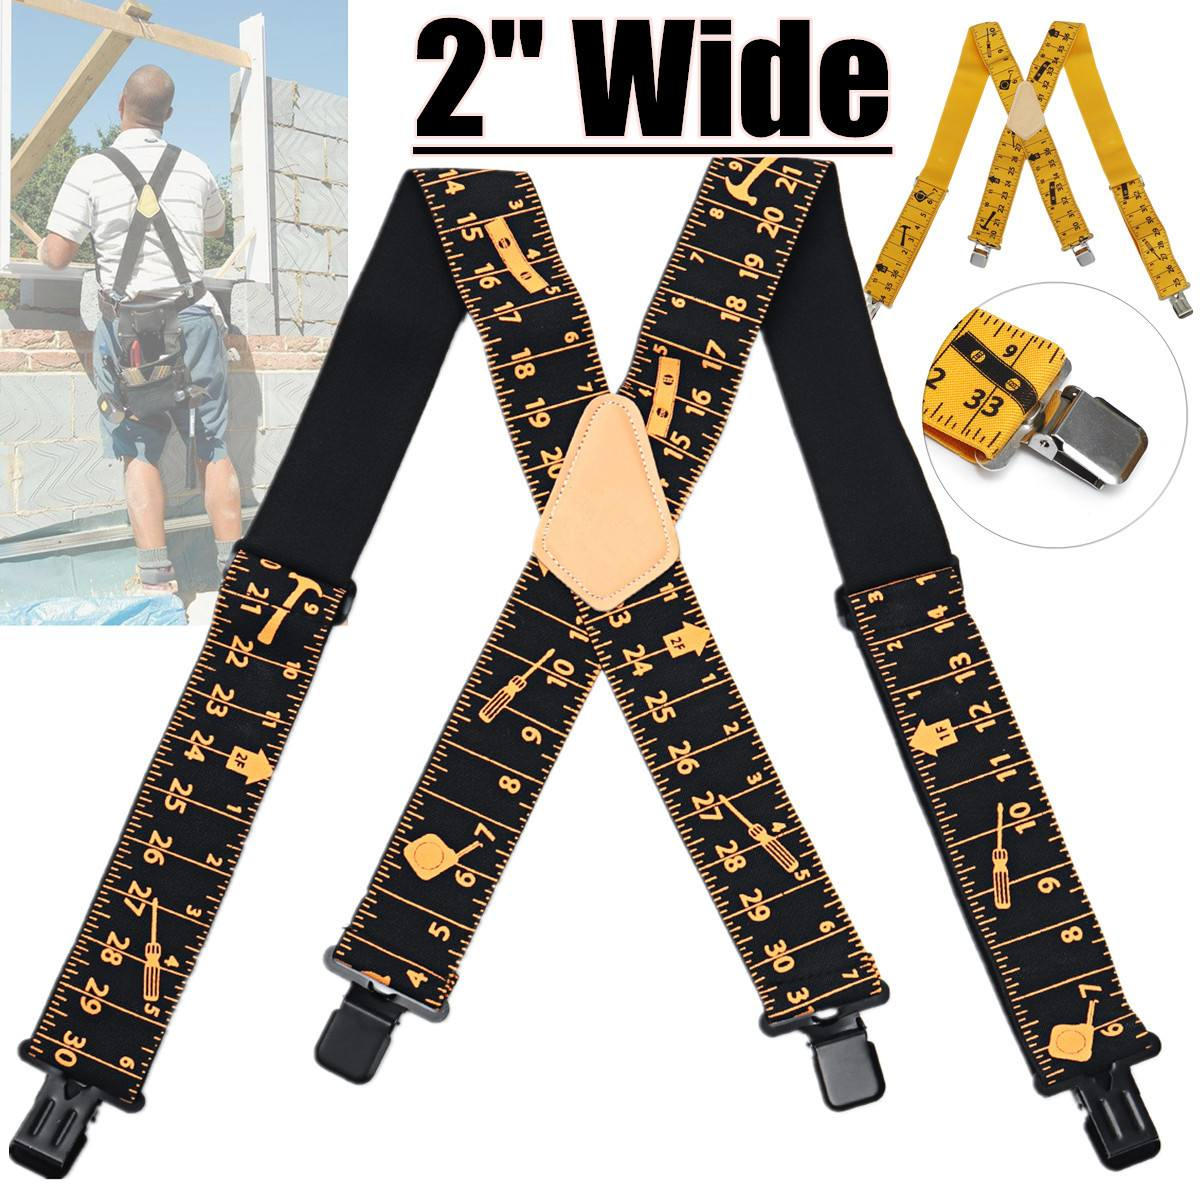 2020 Ruler Design Men Suspenders Adjustable X Shaped 4 Clips Tool Belt Elastic Suspenders Men Trousers Men's Suspenders 120cm